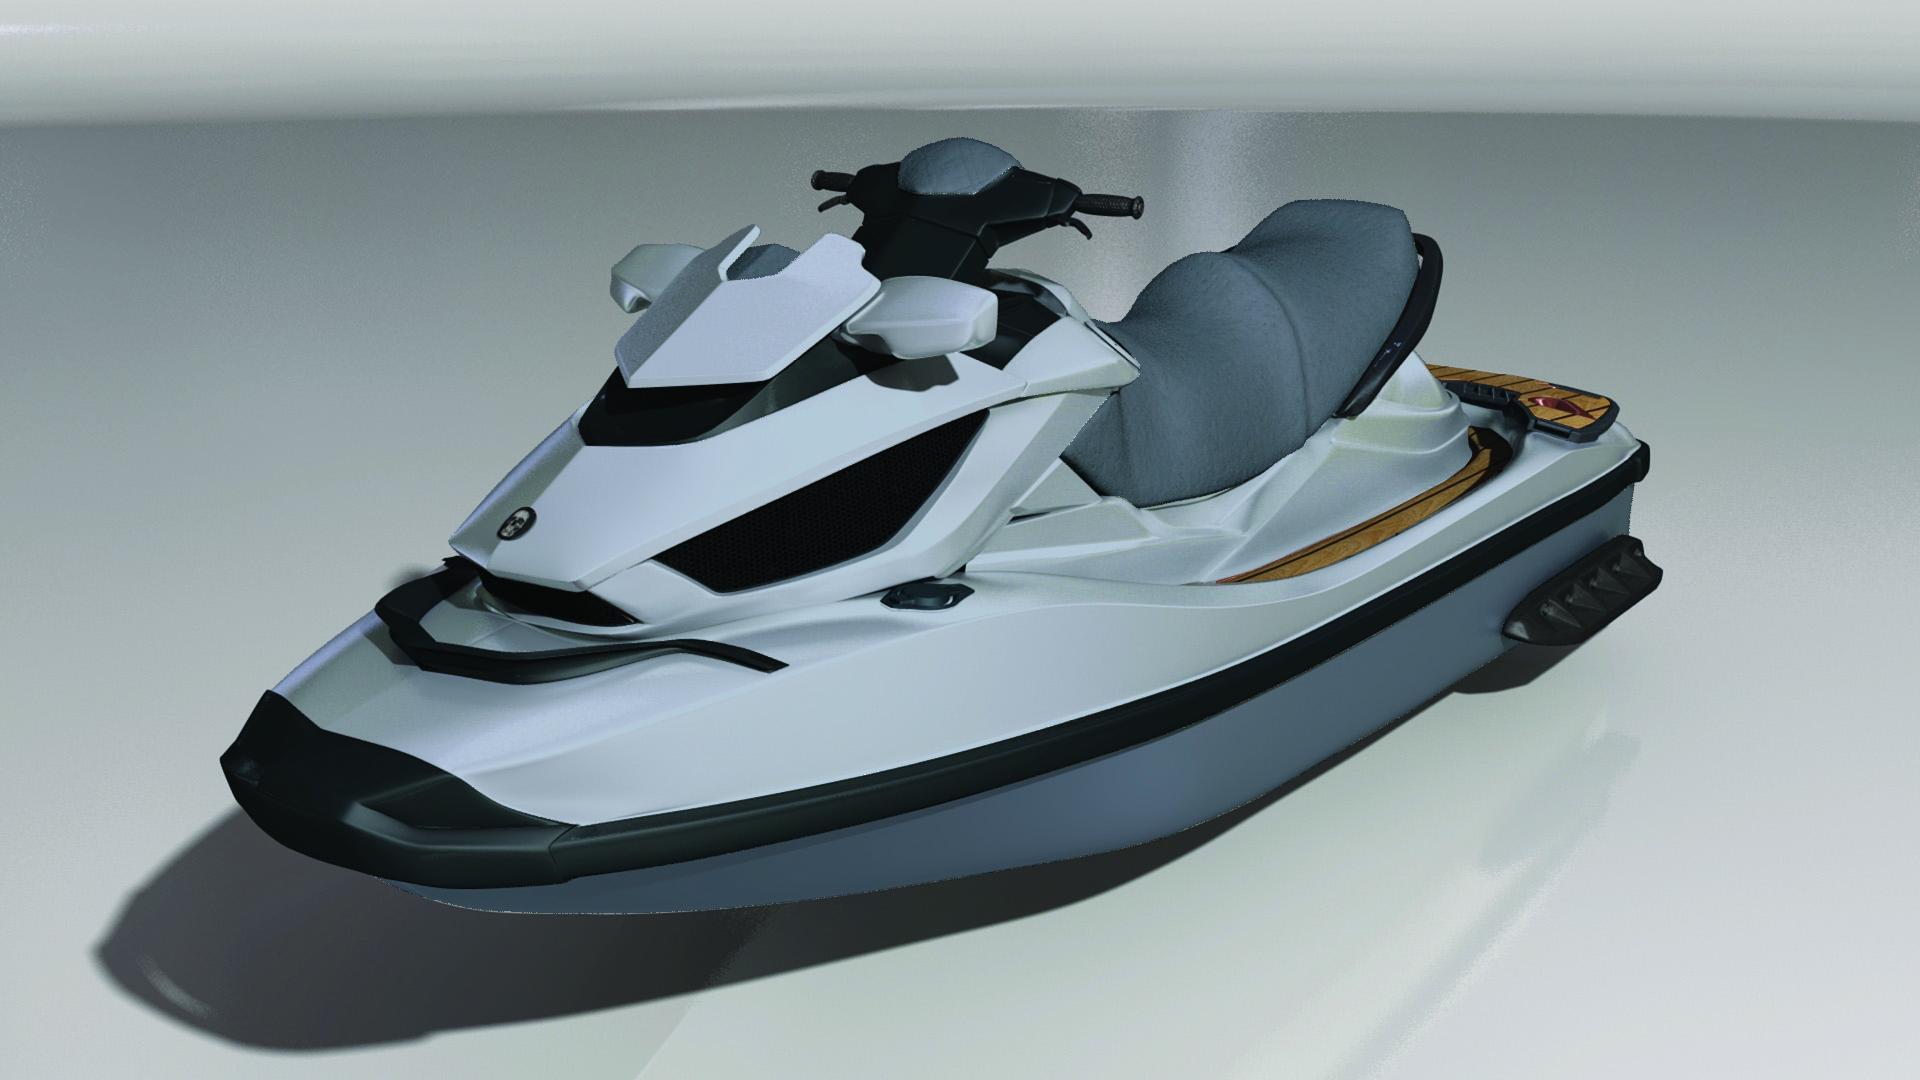 seadoo rxt 260 jet ski dark grey light grey with wood yacht charter superyacht news. Black Bedroom Furniture Sets. Home Design Ideas